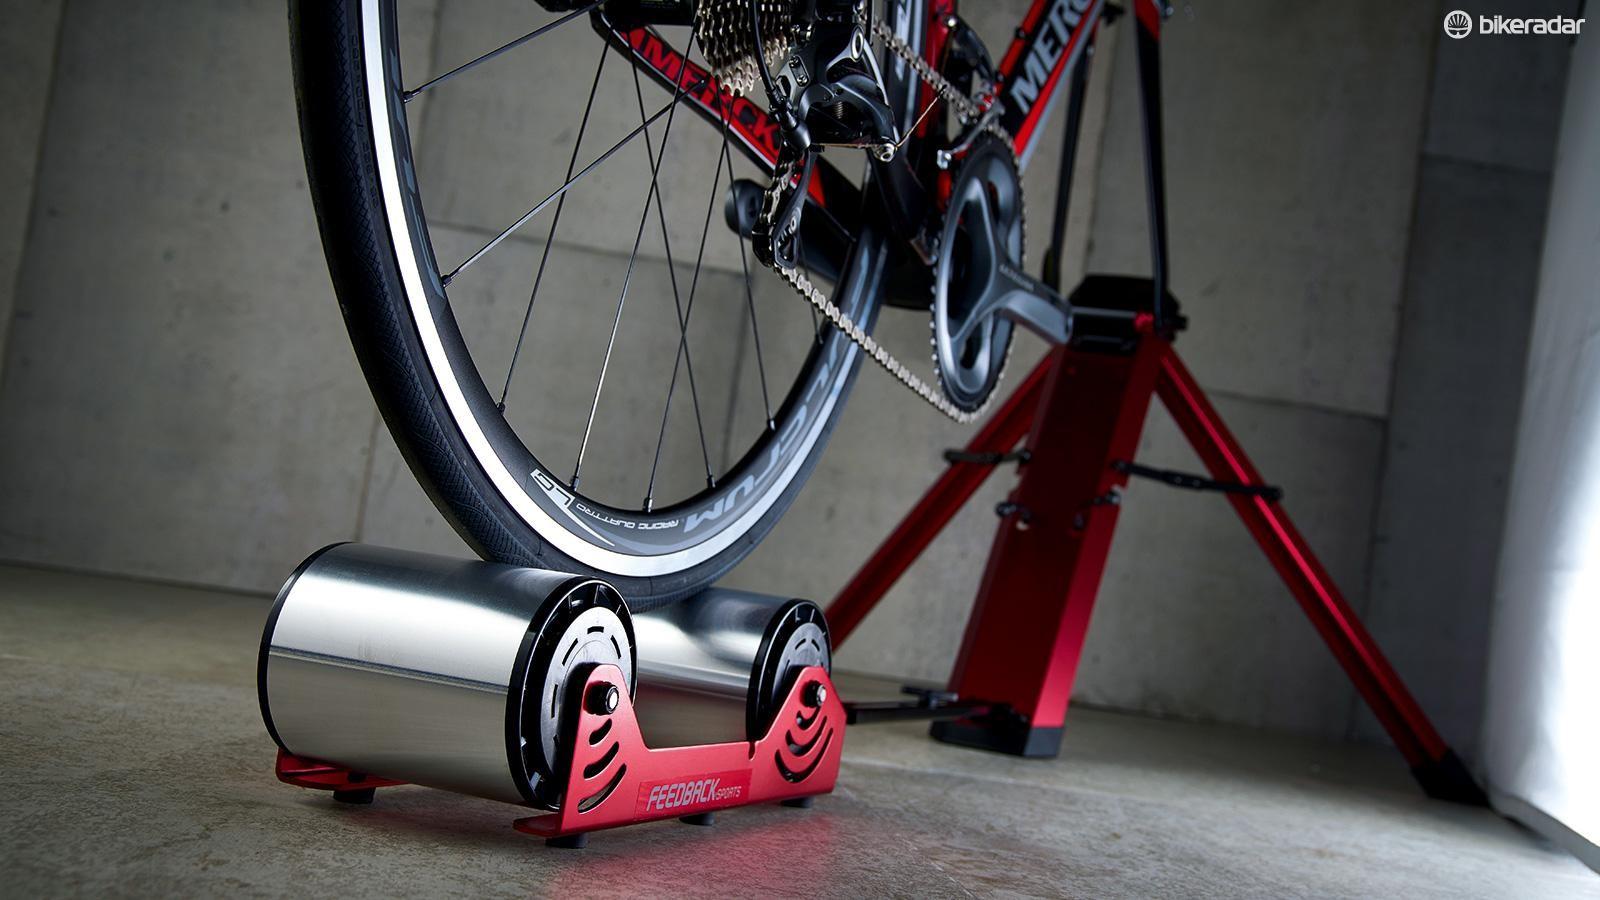 Feedback's Omnium turbo uses rollers instead of a flywheel